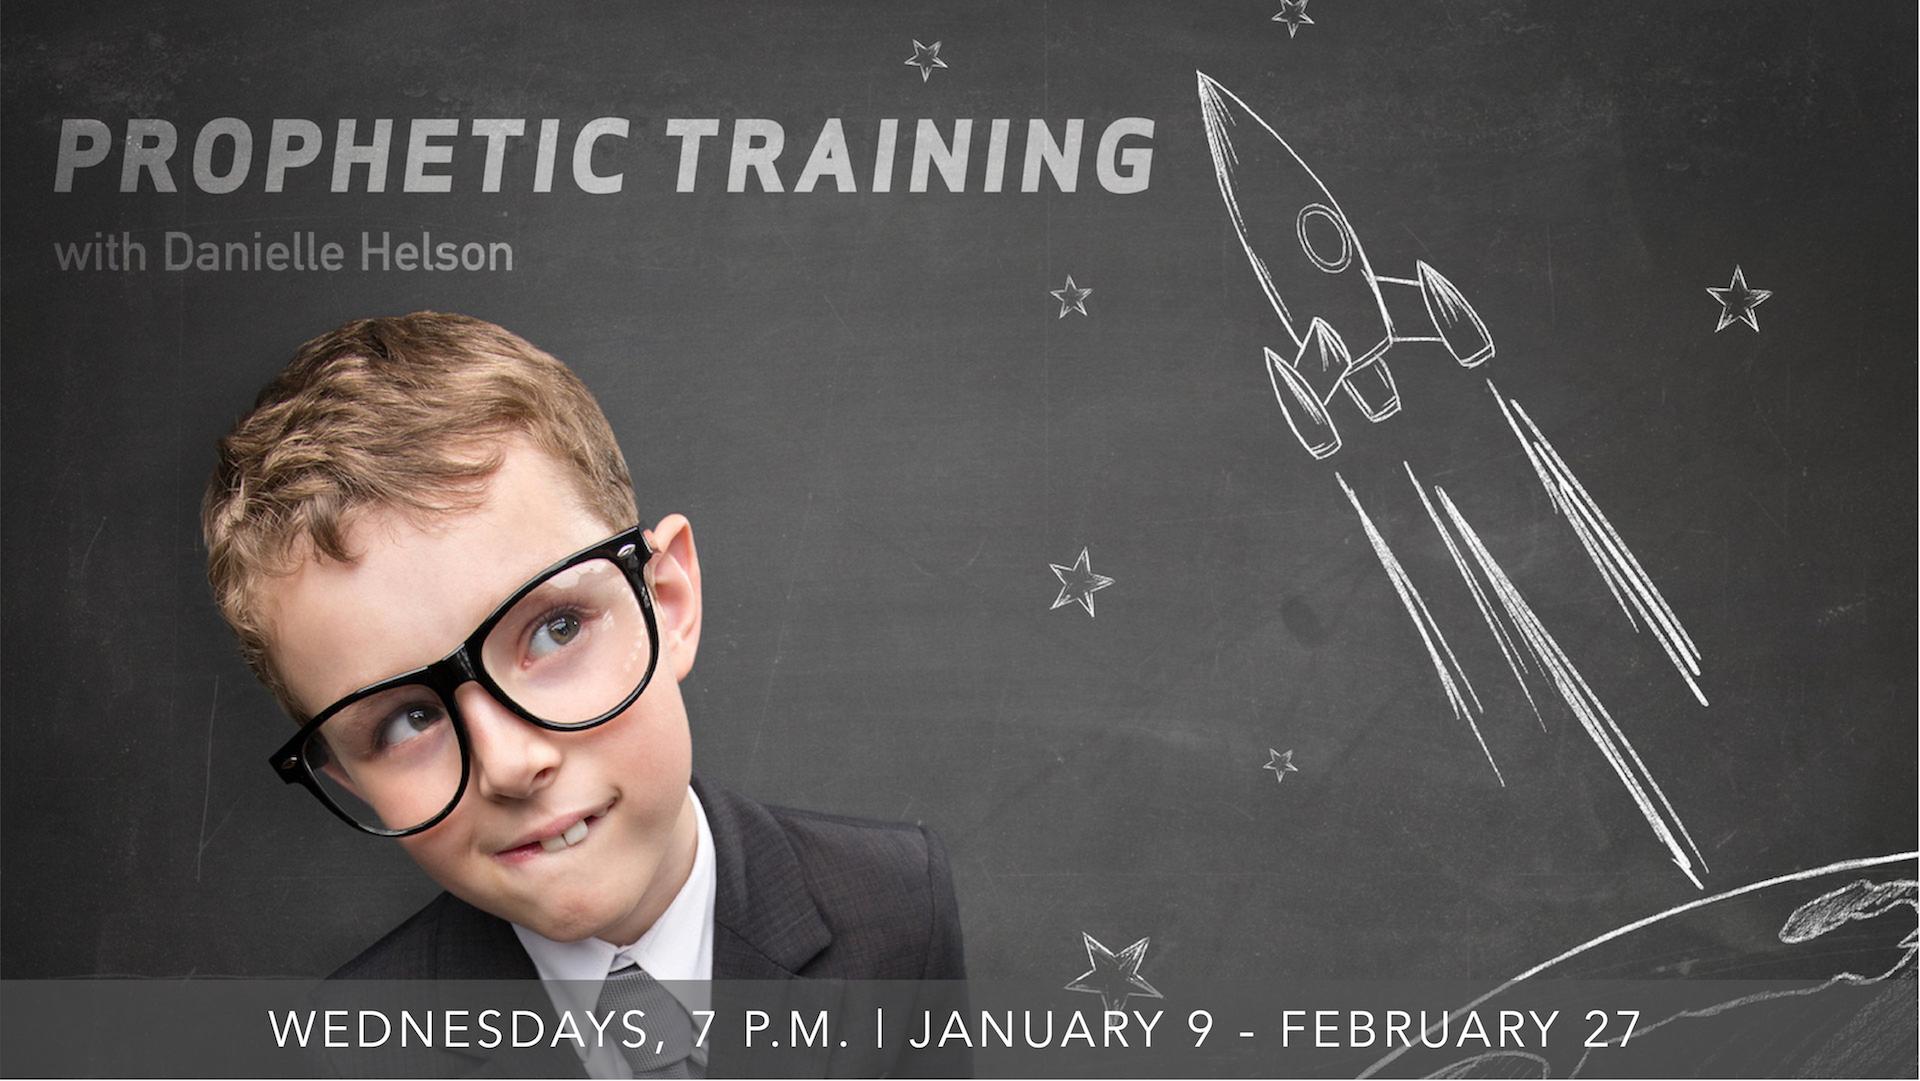 prophetic training-10.jpg